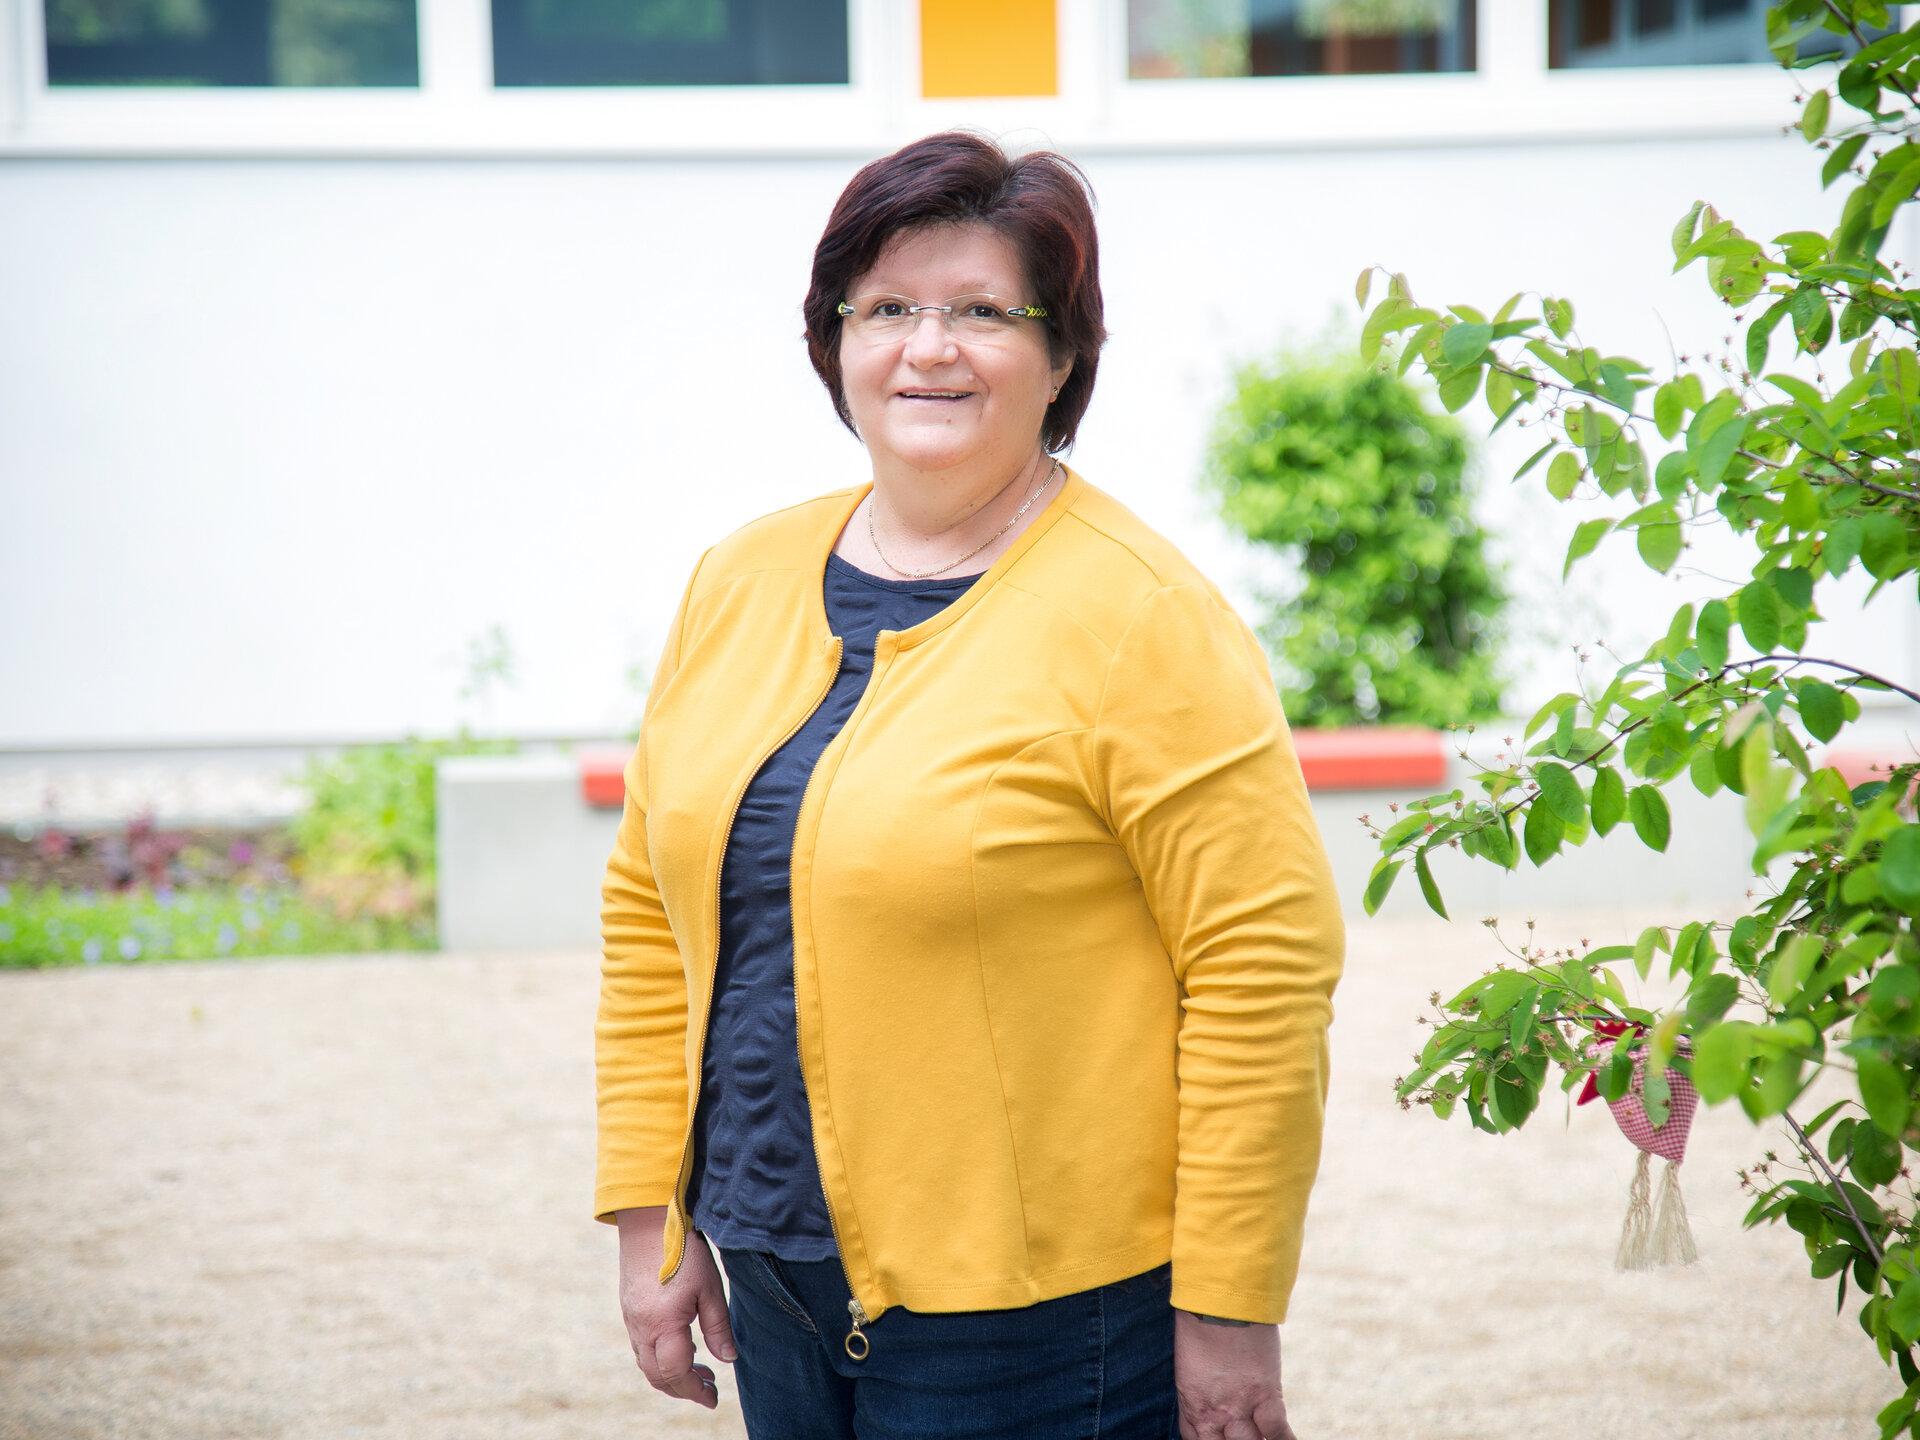 Frau Kaatz